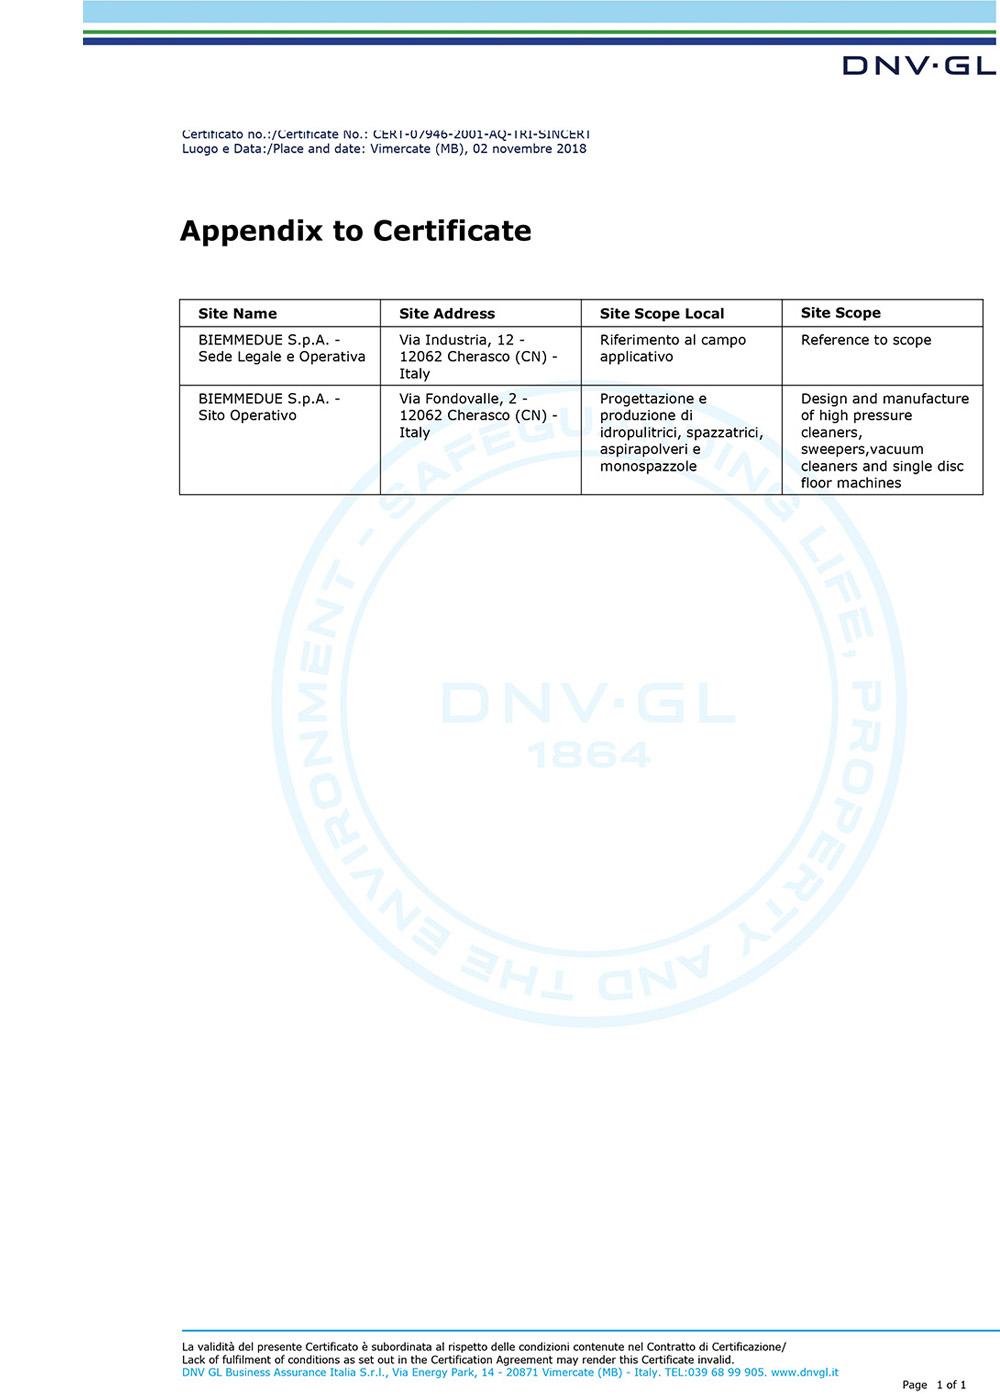 ISO9001_2 BIEMMEDUE S.P.A..jpg